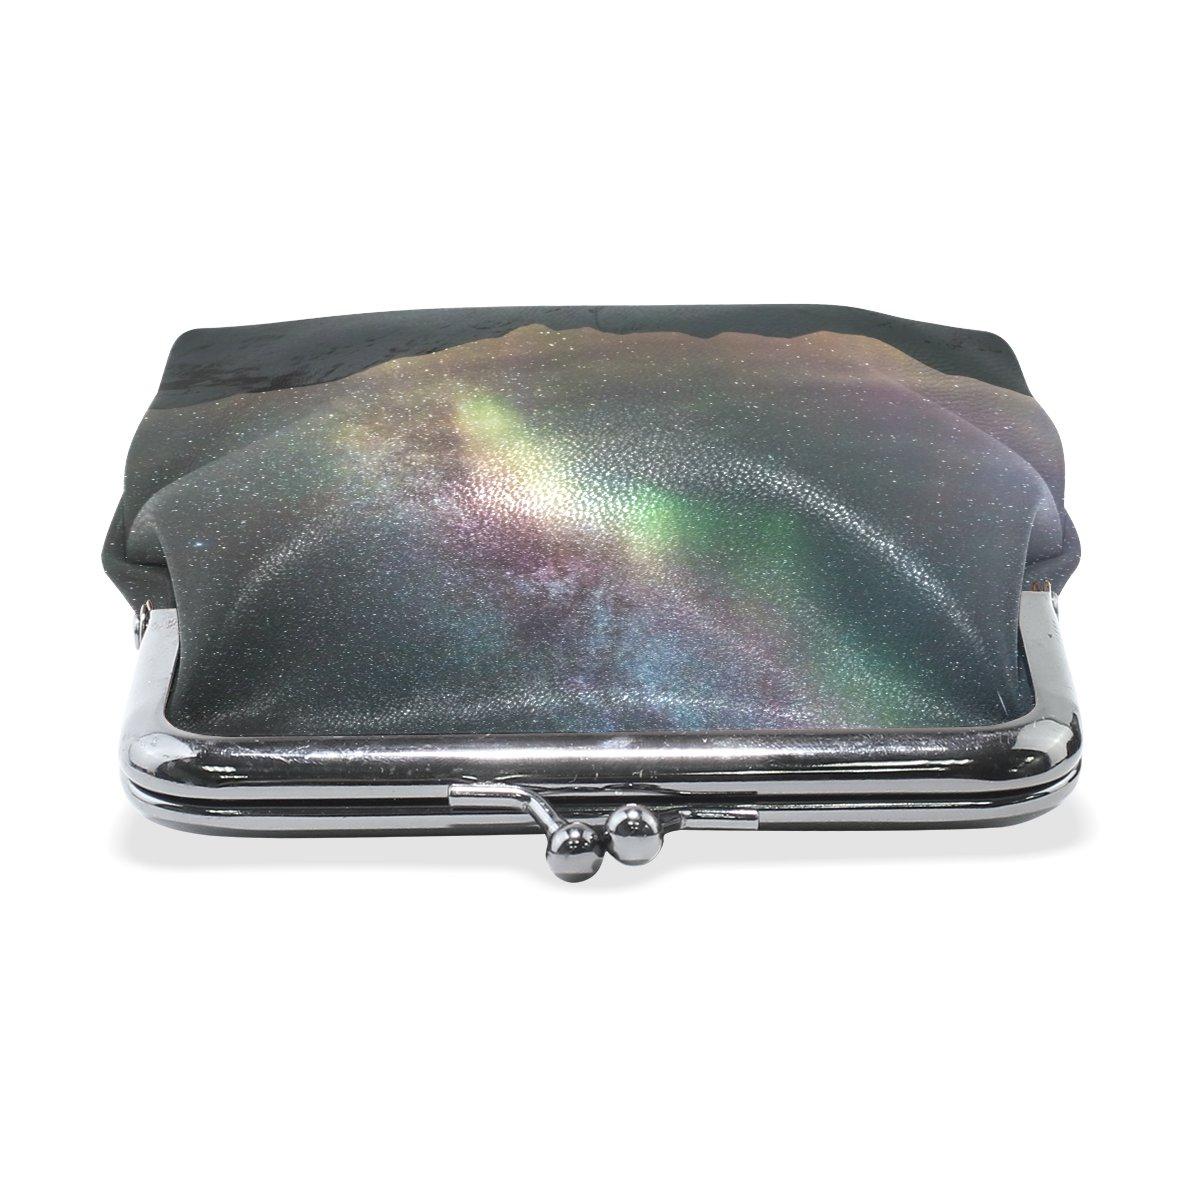 Coin Purse Night Stars Mountain Wallet Buckle Clutch Handbag For Women Girl Gift